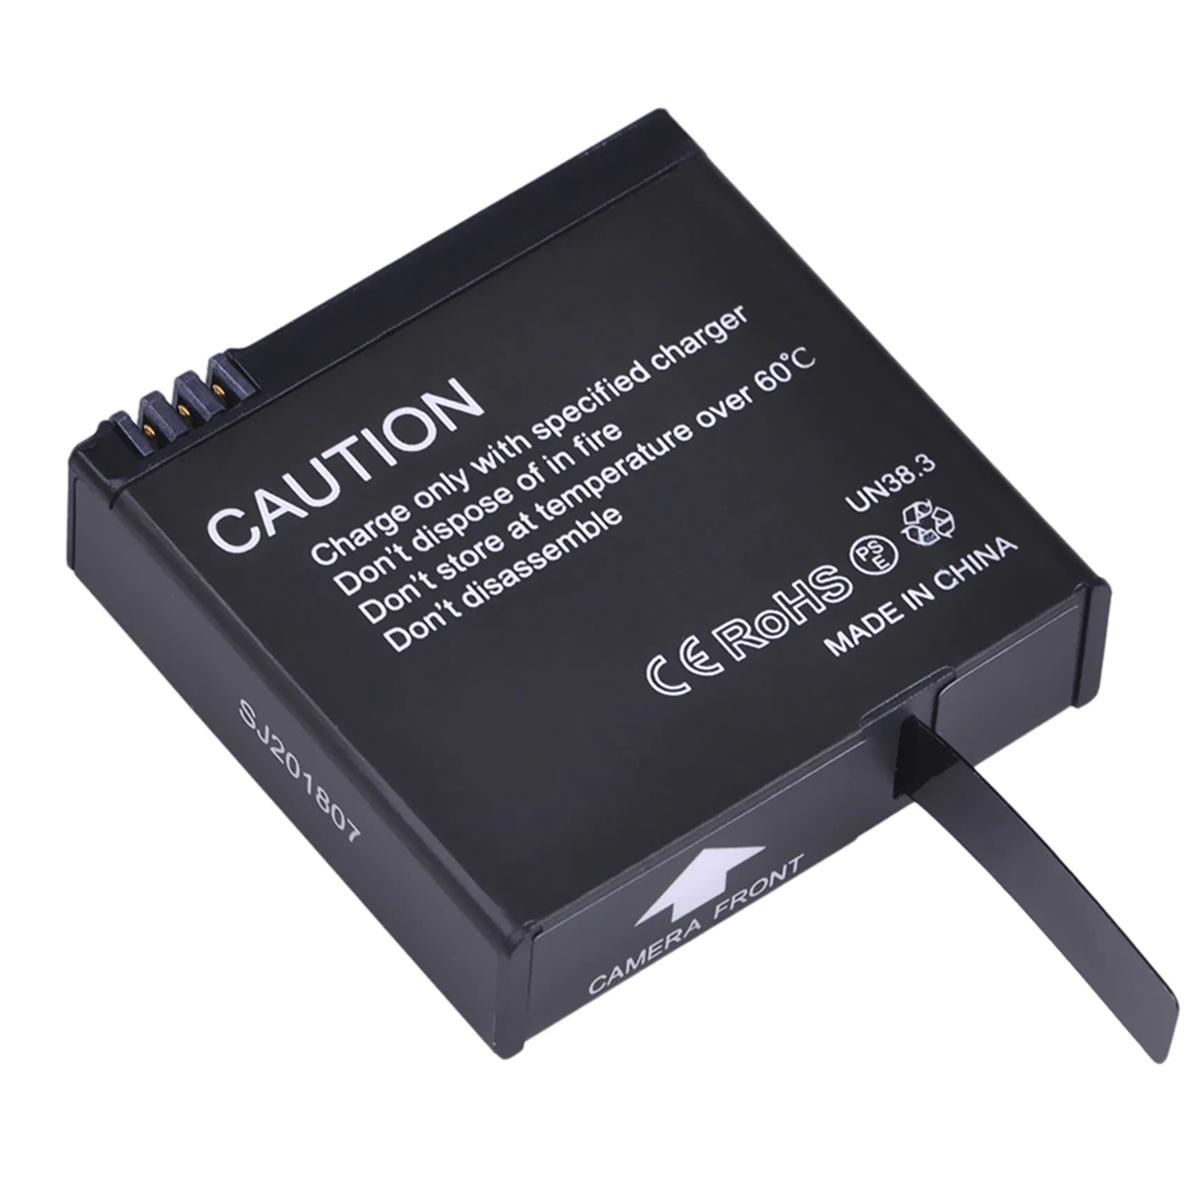 Bateria SJCAM SJ8 - 3.8V - 1200mAh - 4.56Wh - Li-ion